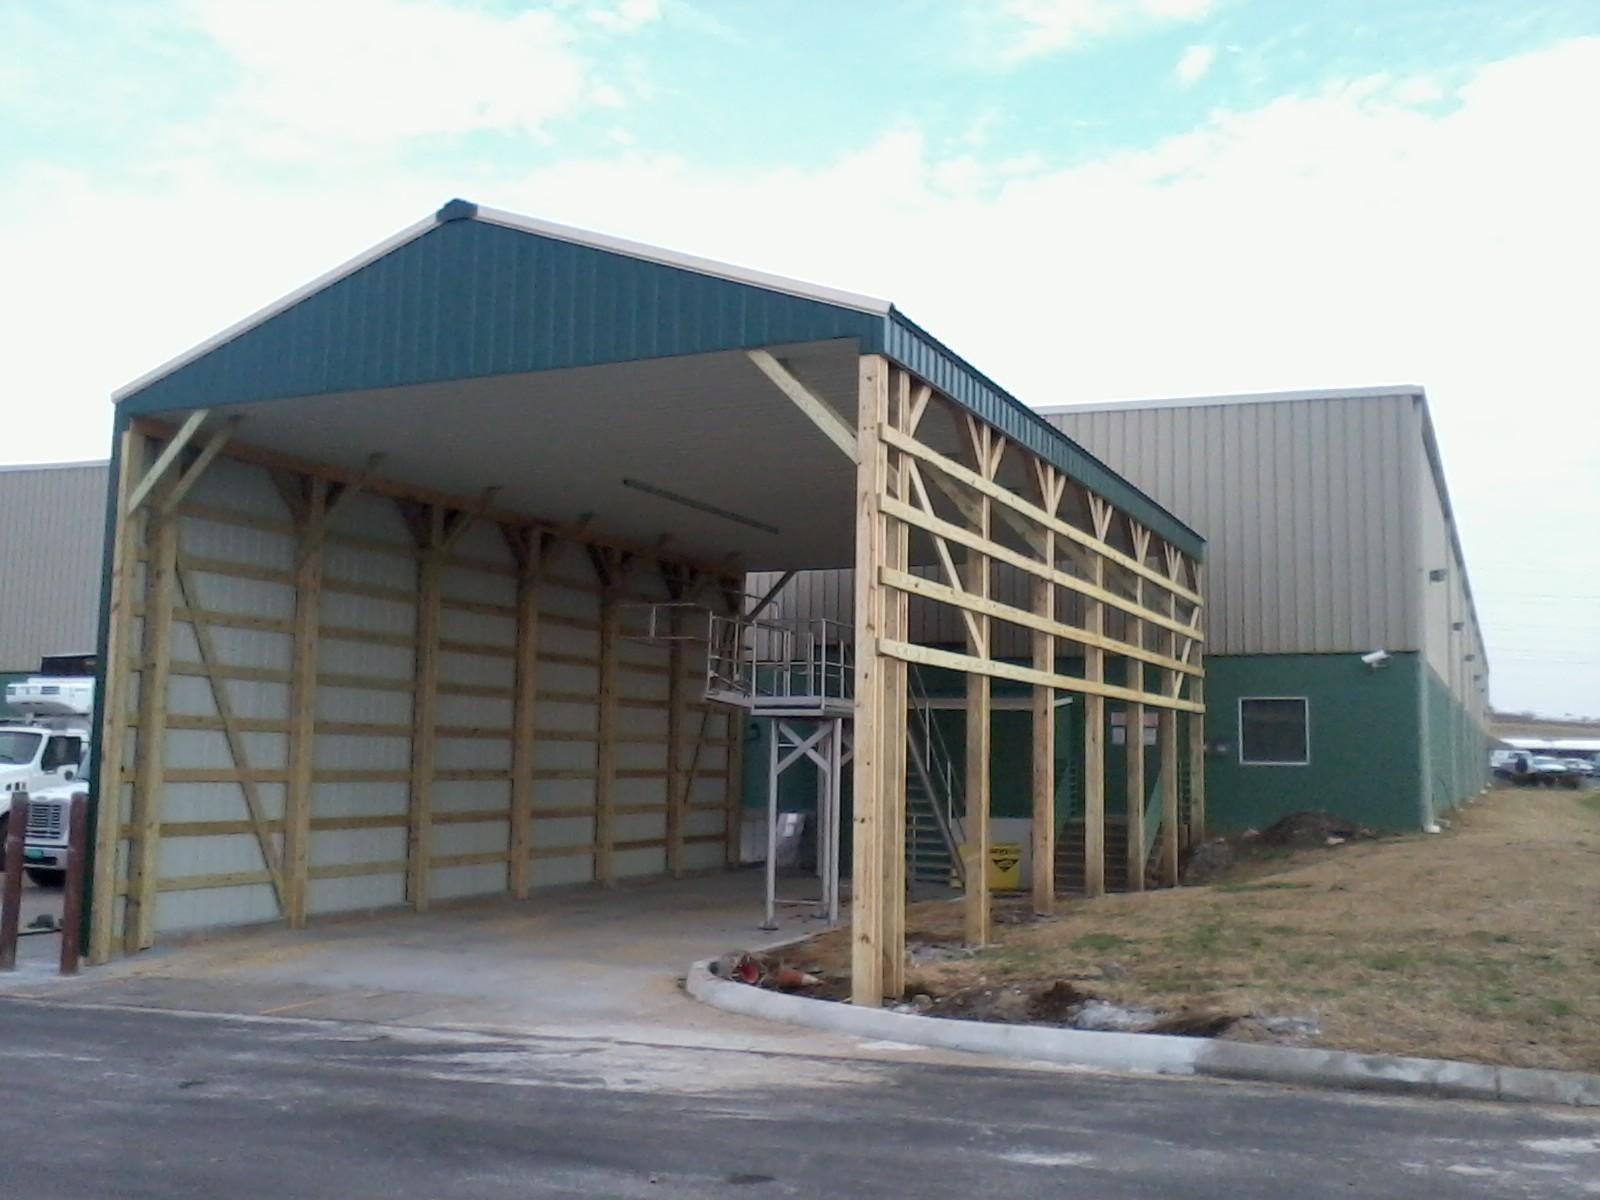 30x50x20 equipment building www nationalbarn com national barn